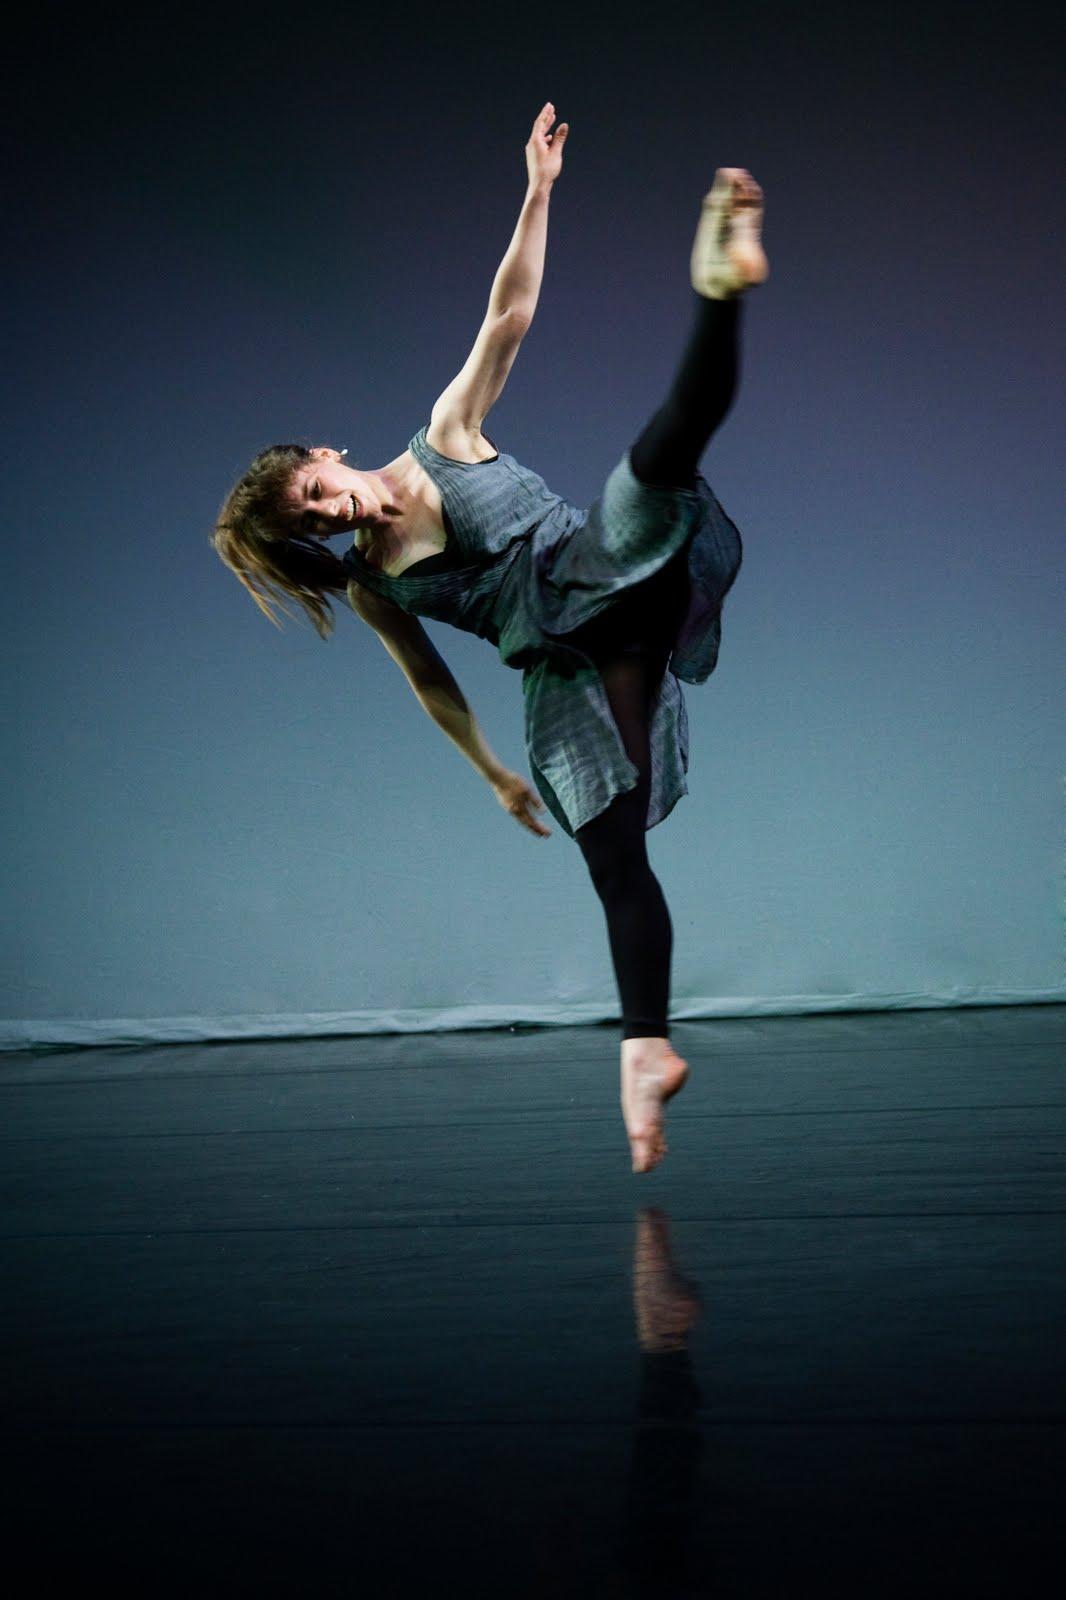 Cute Photography Love: Dance Photography